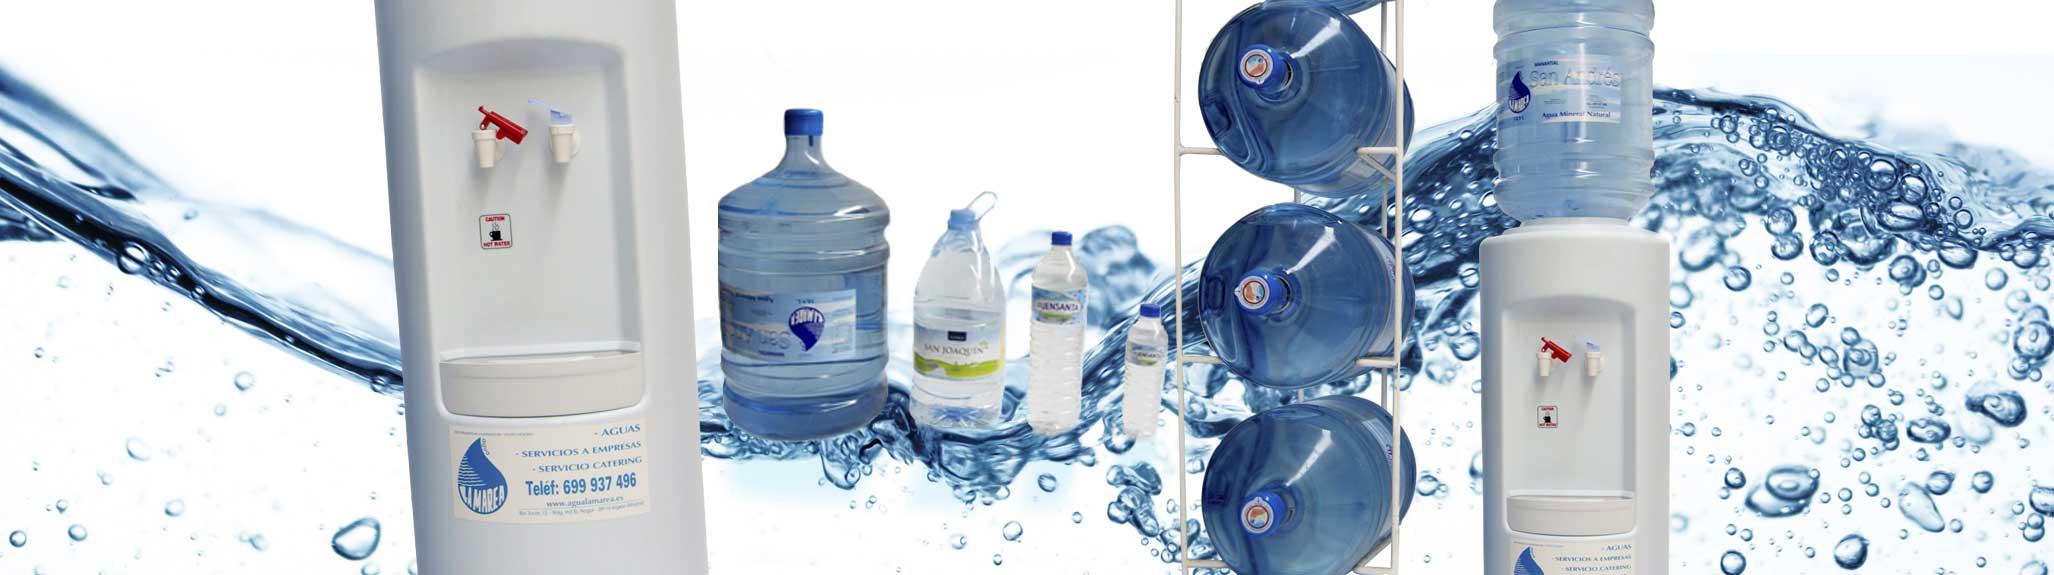 Distribución de agua mineral embotellada